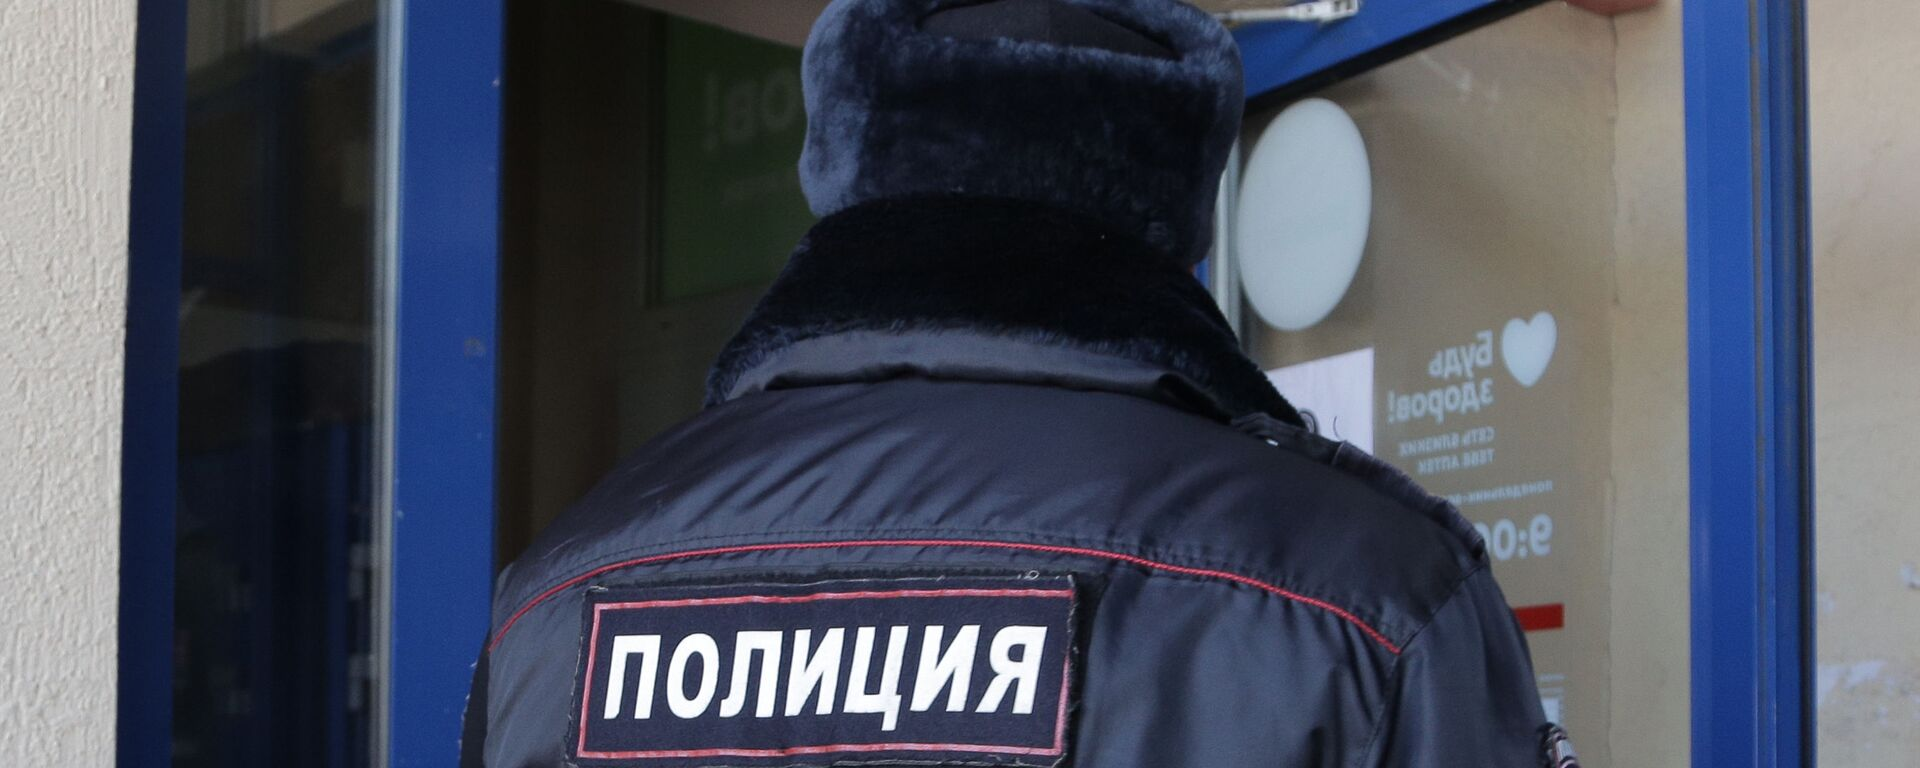 Сотрудник полиции, архивное фото - Sputnik Тоҷикистон, 1920, 24.09.2021